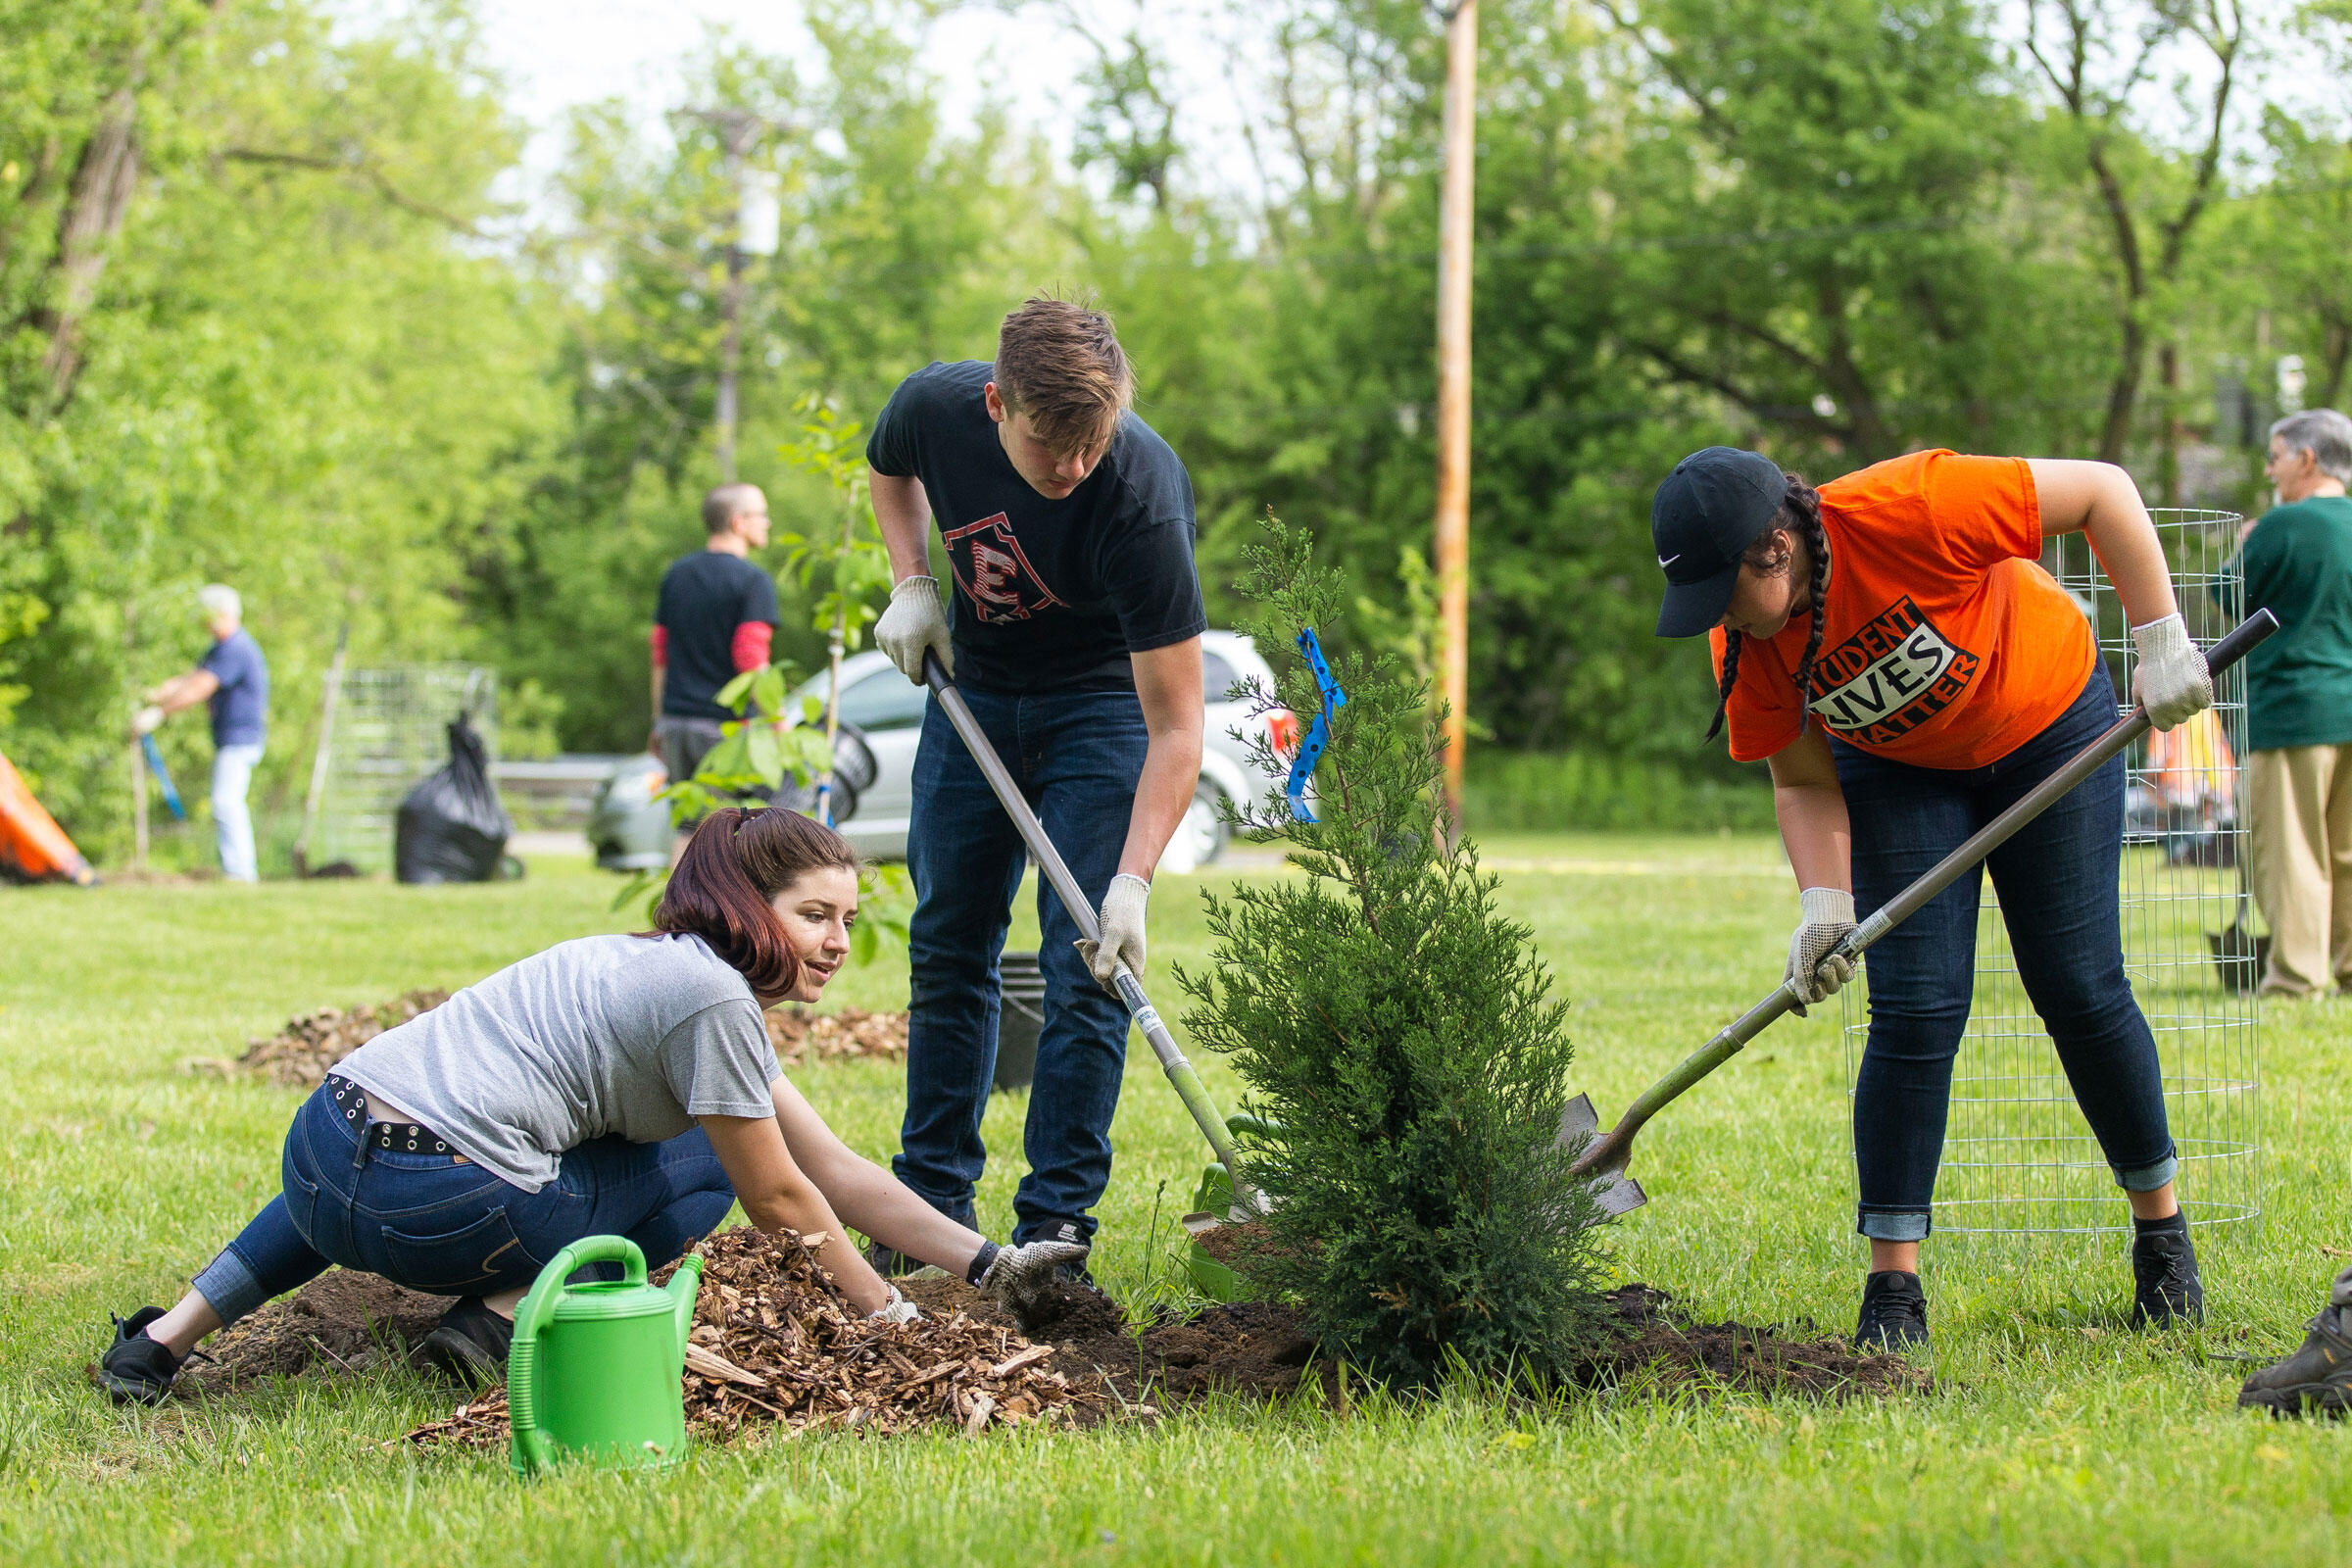 High school volunteers Paige Keim, Gage Norris, and Zoe Gonzalez plant an eastern red cedar tree at the Black River Audubon Park in Elyria, Ohio. Allison Farrand